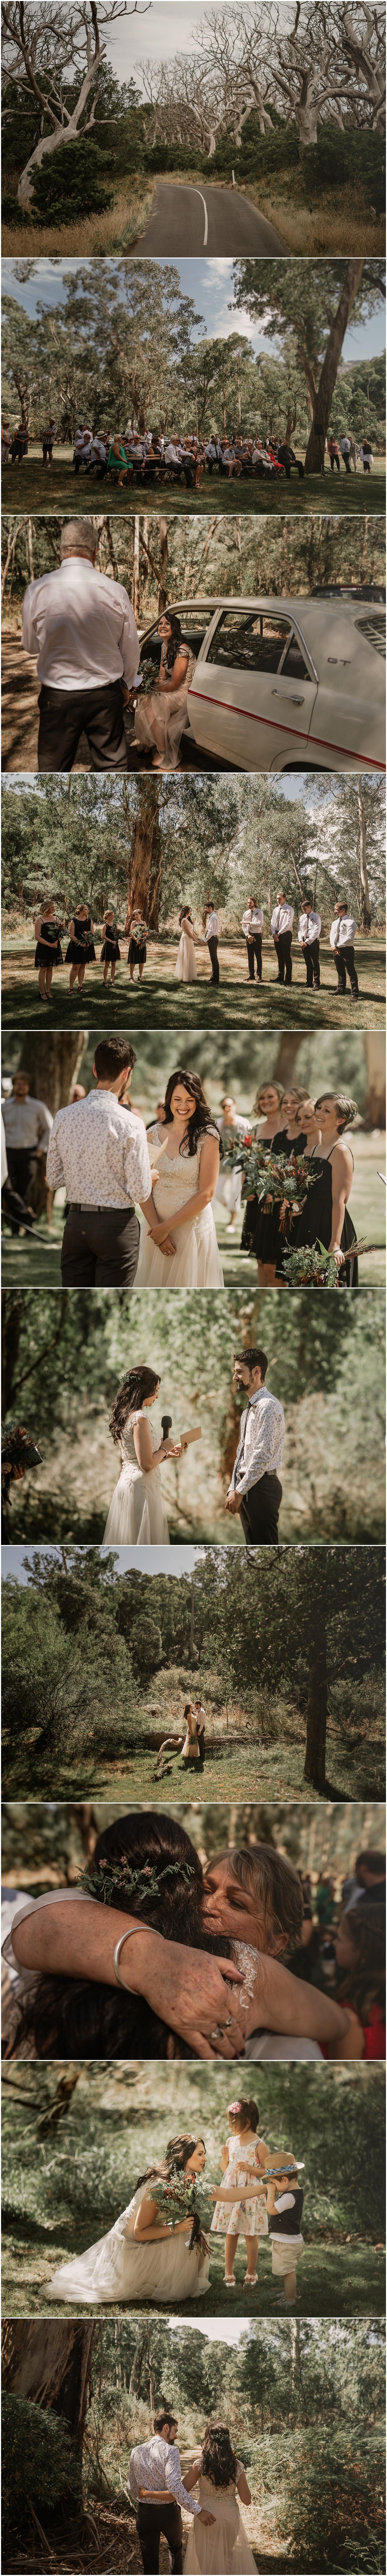 Pablo Laguia wedding Australia  0063.jpg